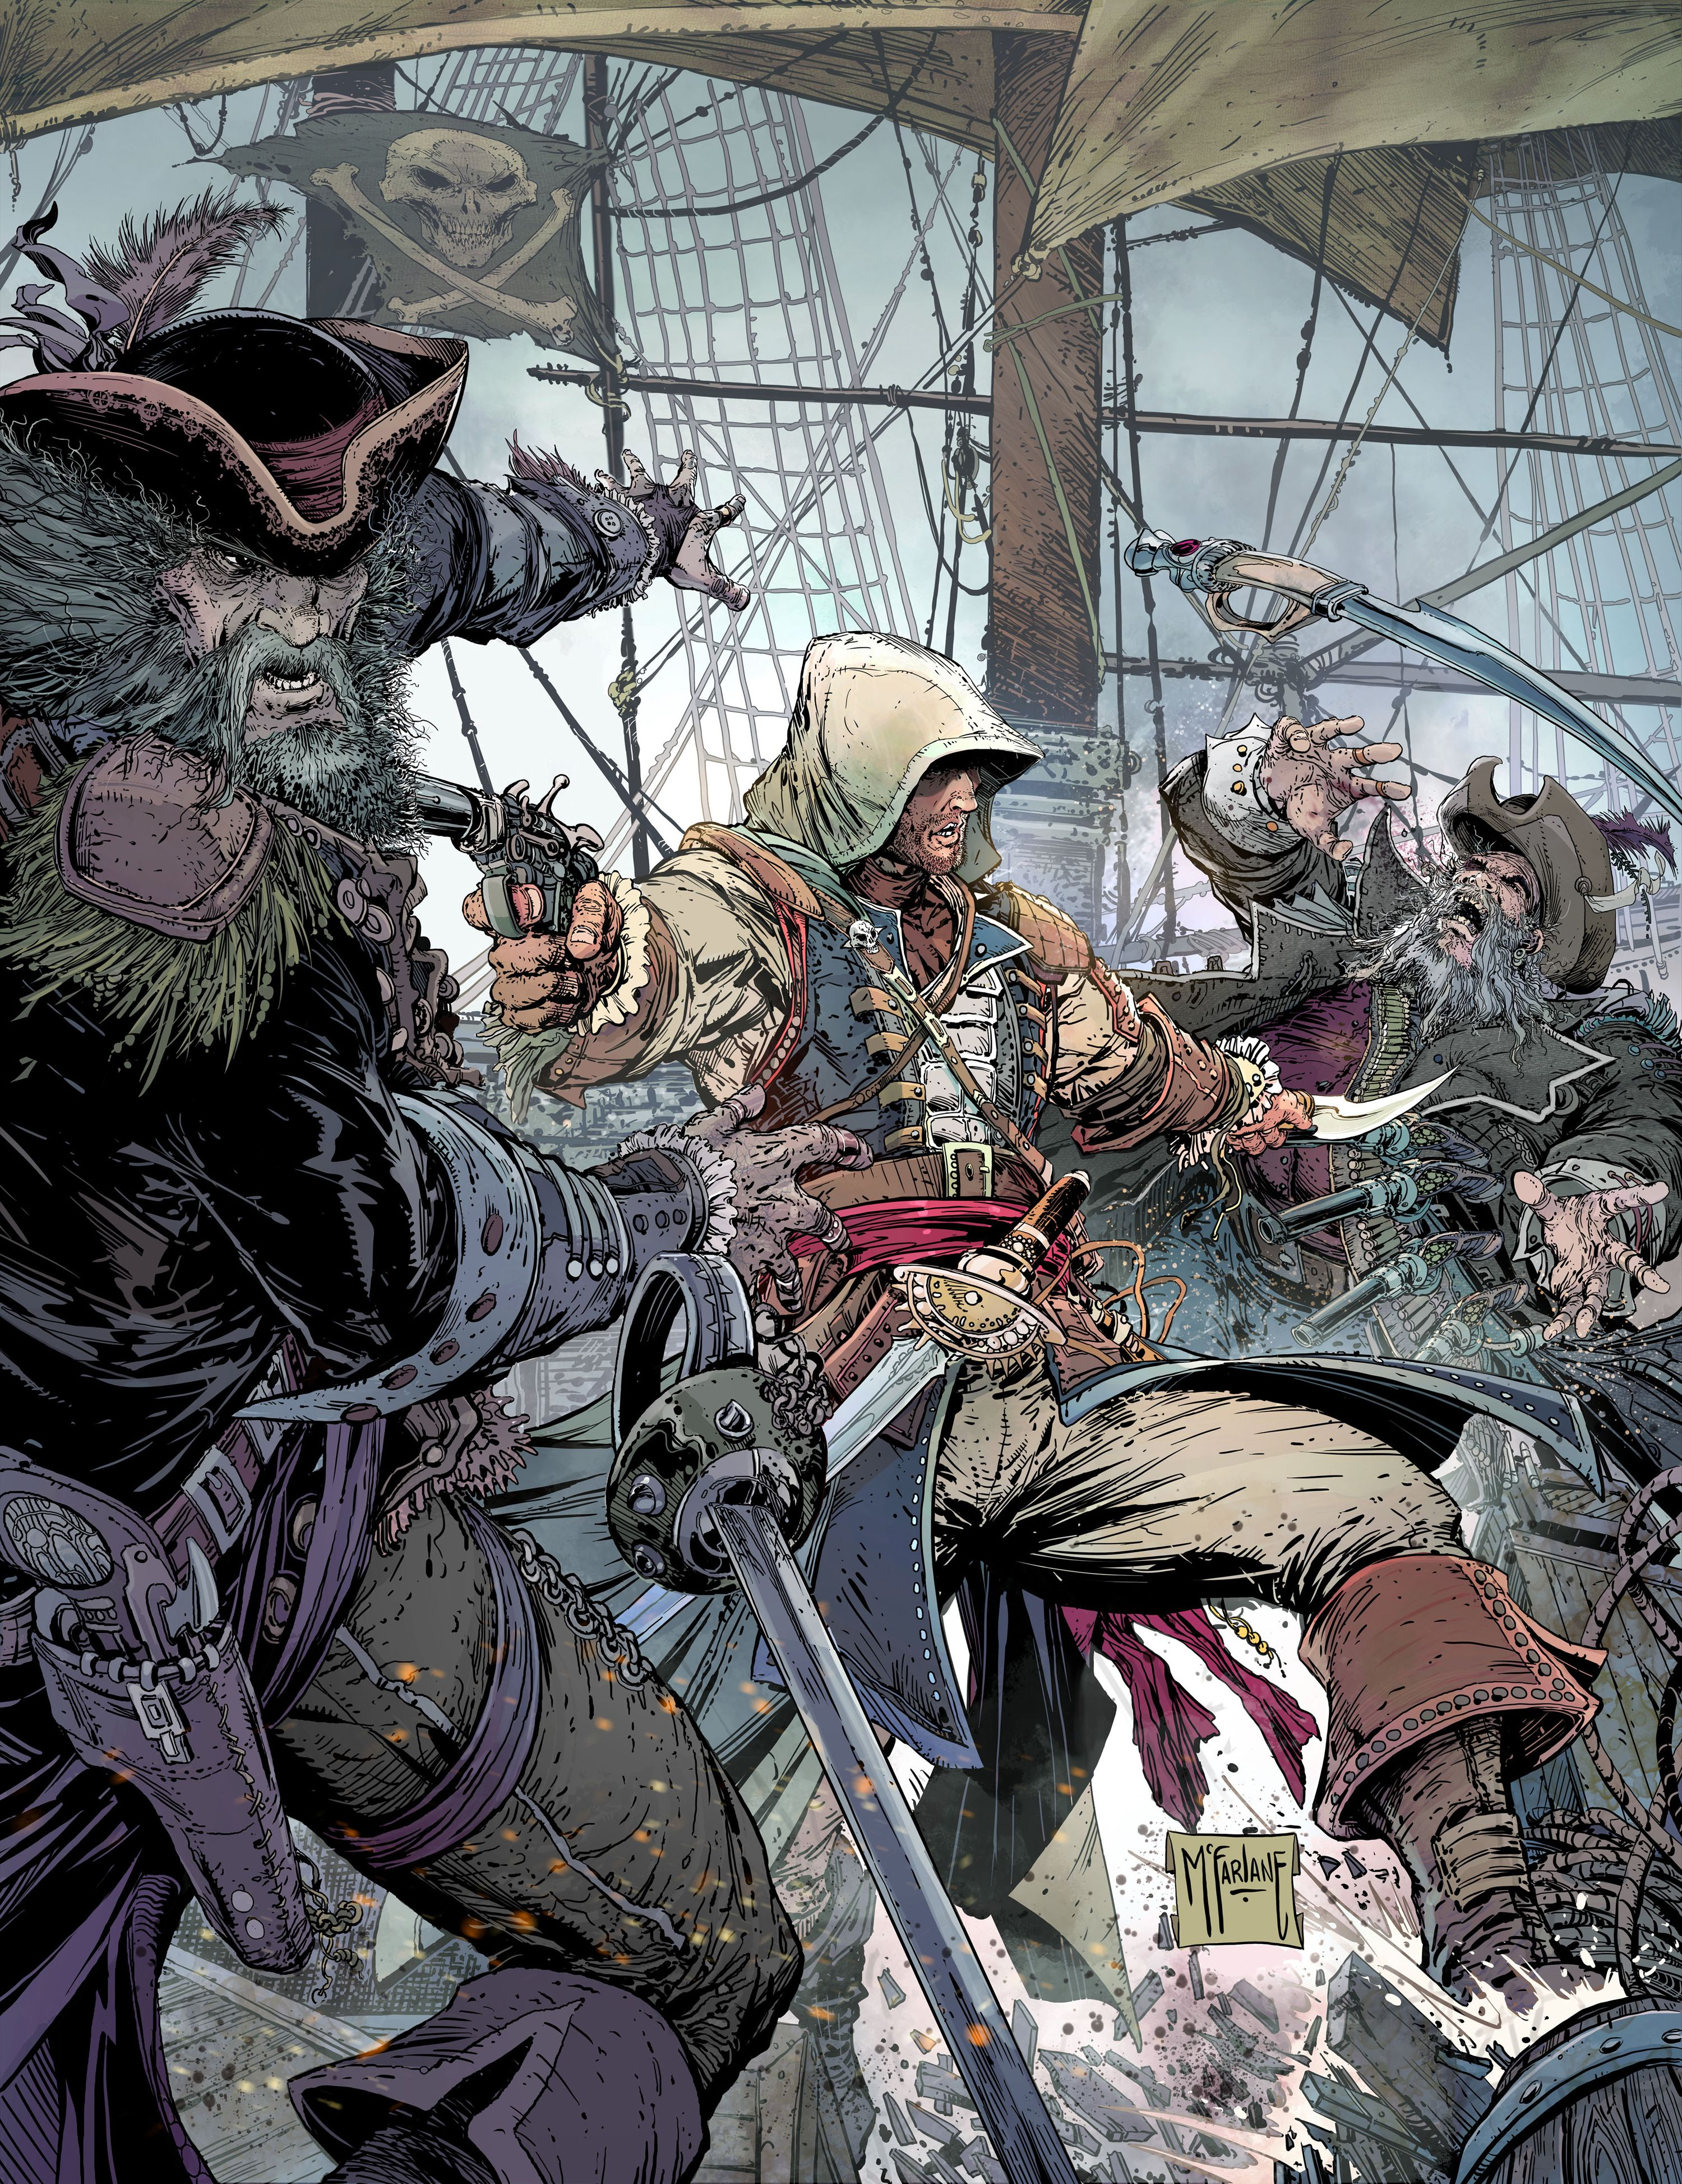 Black flag creed 4 book assassins